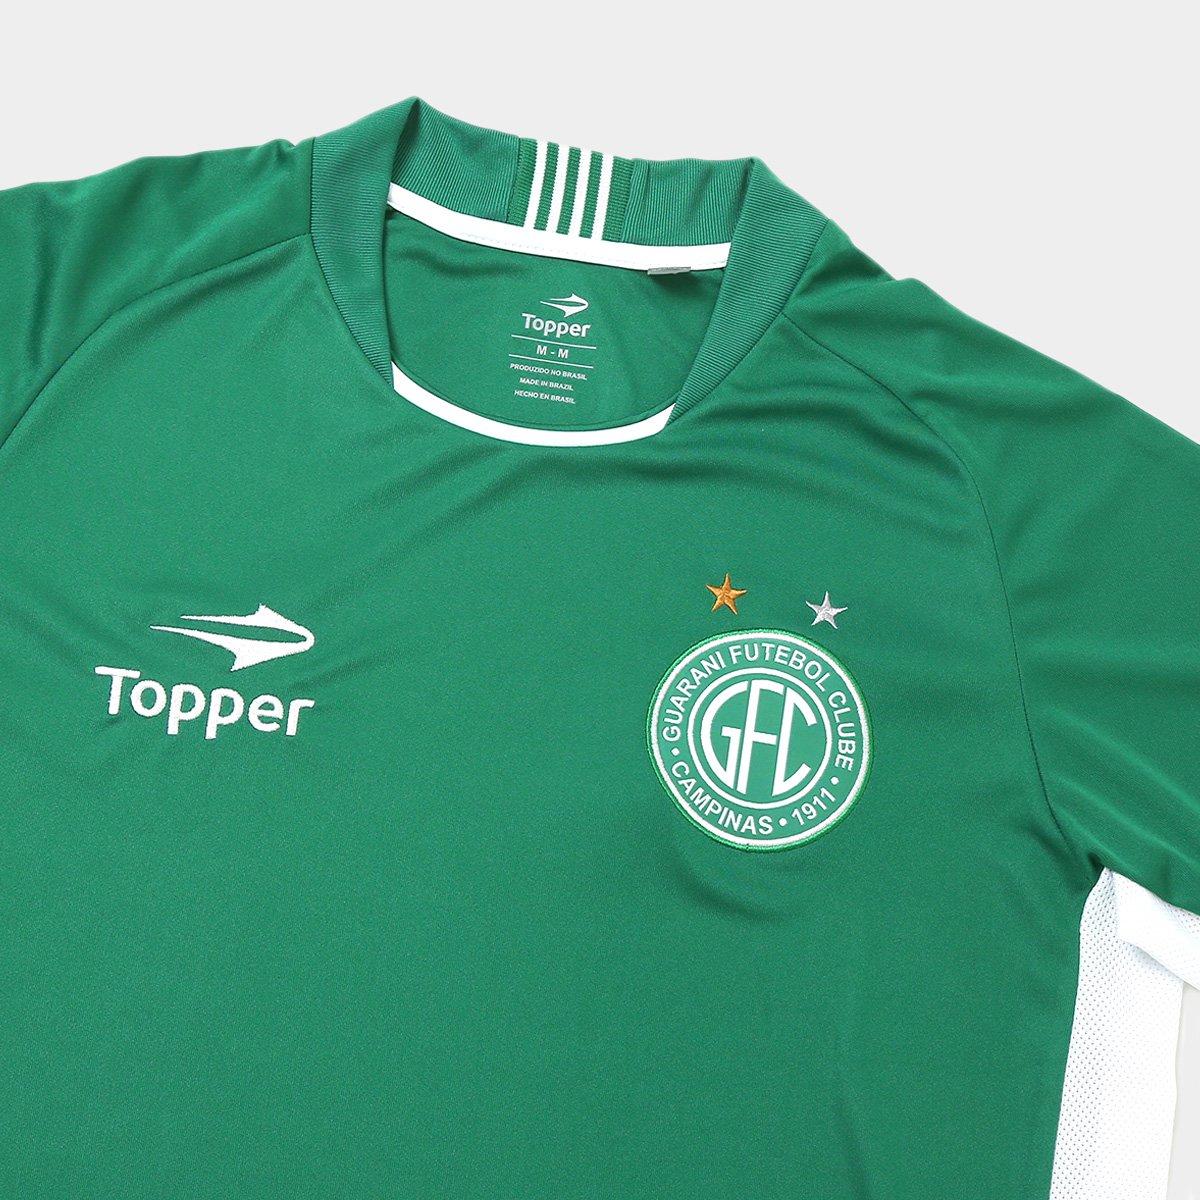 Camisa Guarani I 17 18 s n° - Torcedor Topper Masculina - Compre ... 9404f09a6d2be